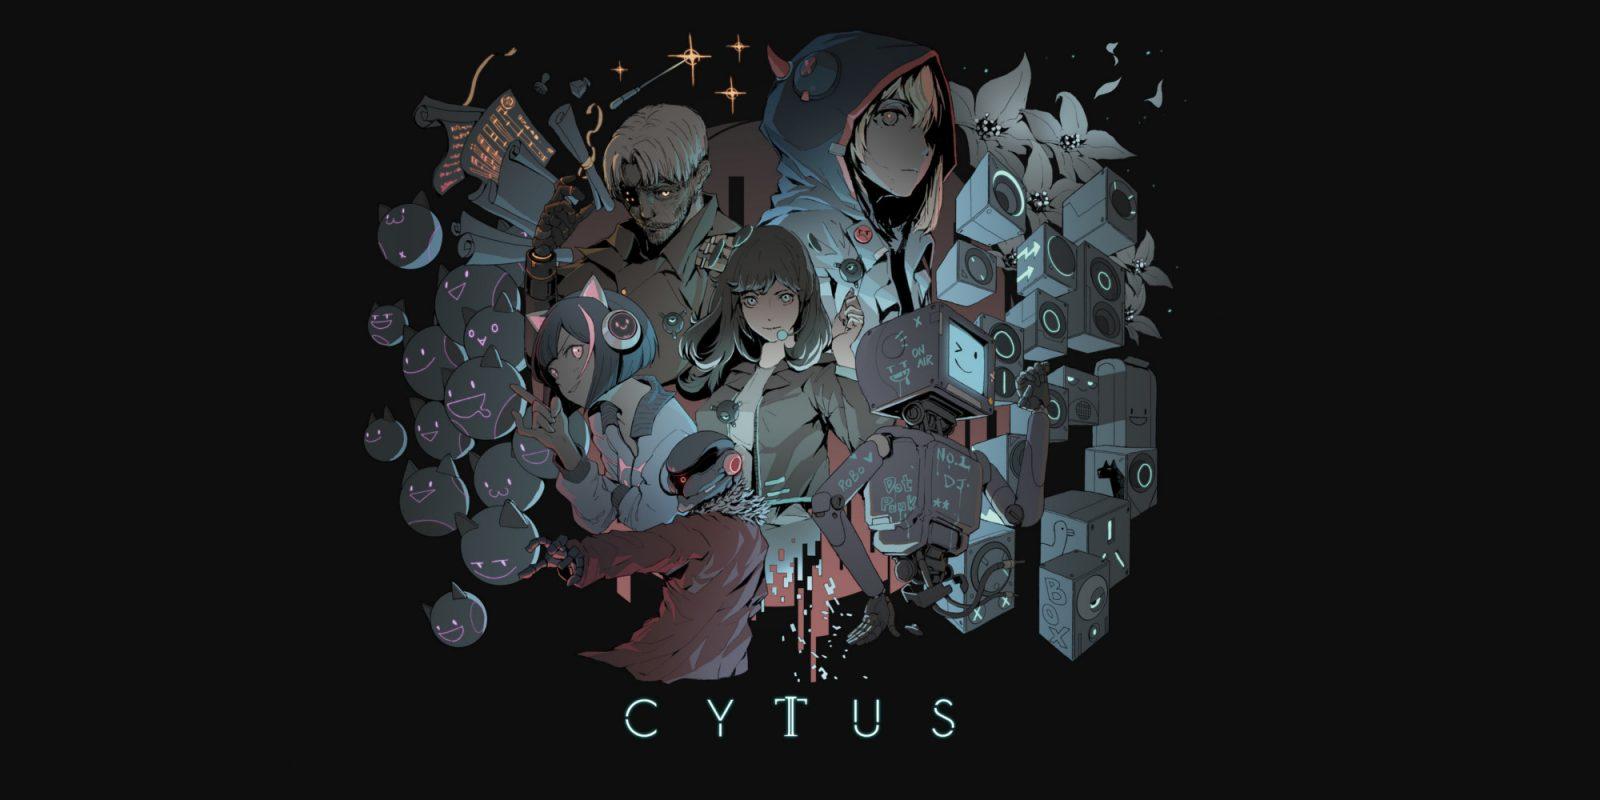 What I Thought of 'Cytus II'